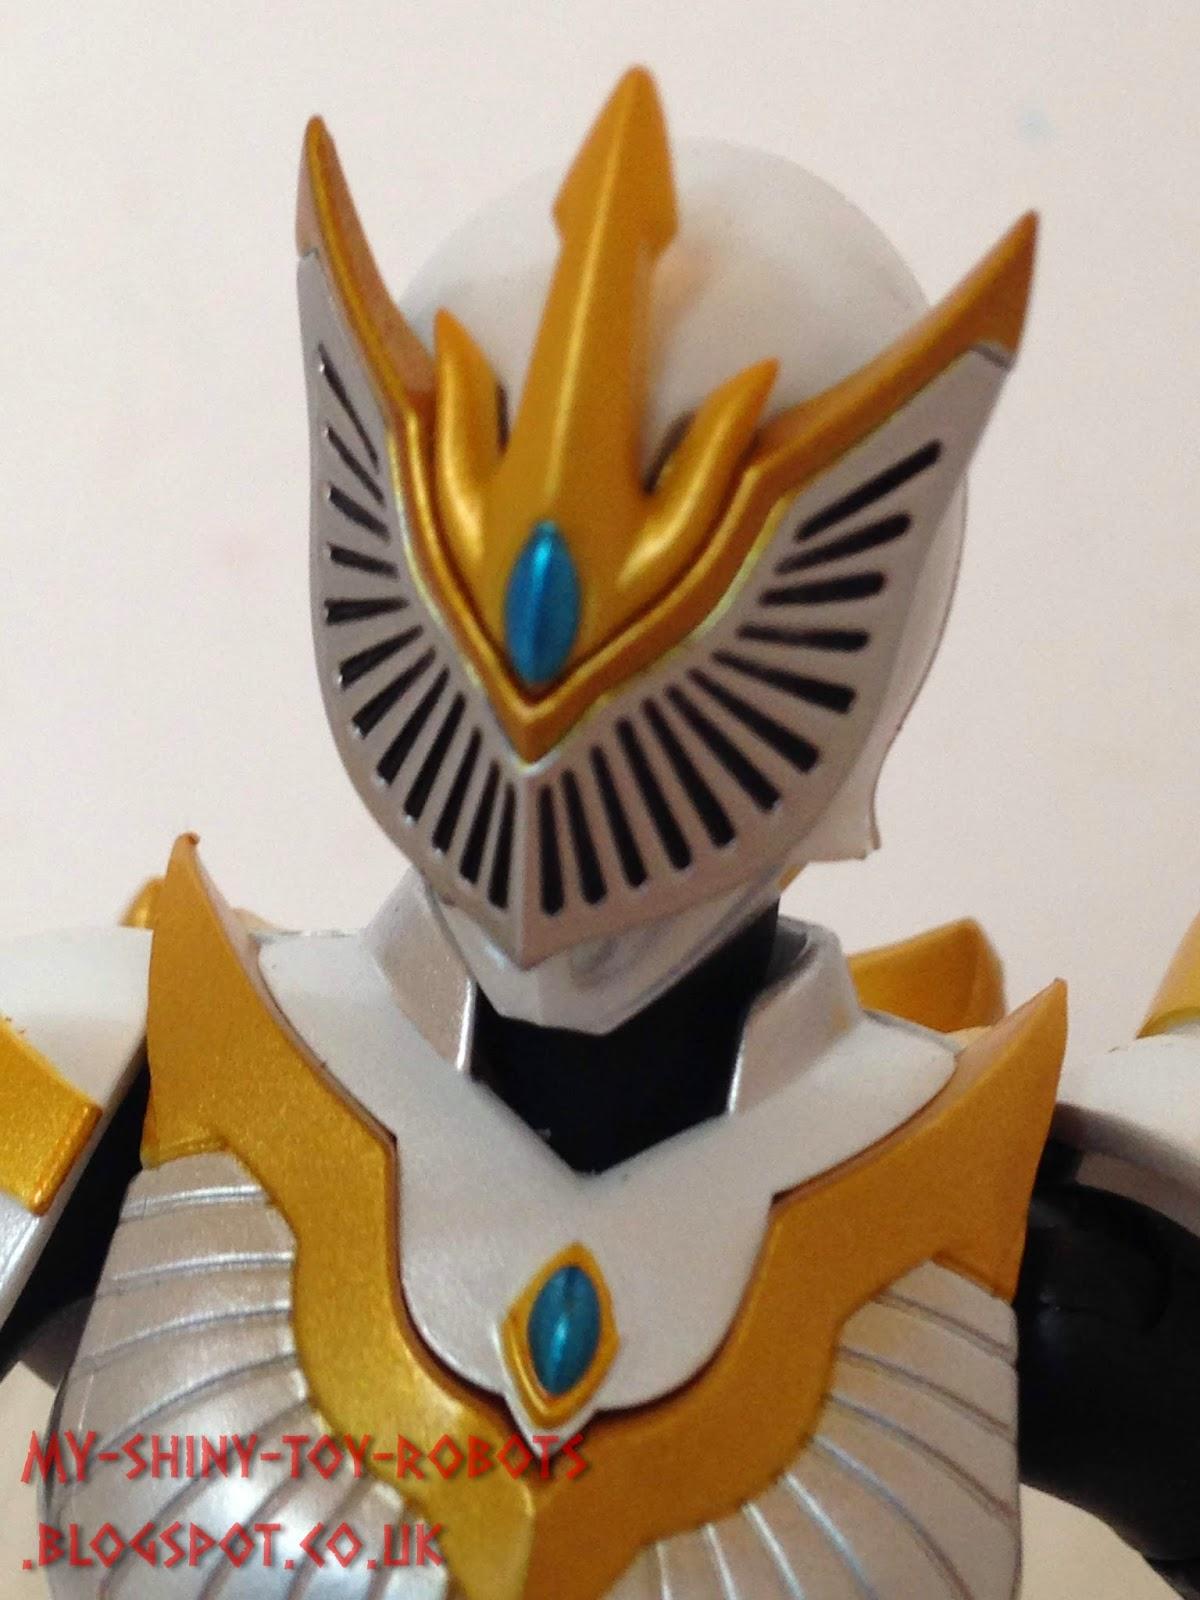 S.H. Figuarts Kamen Rider Femme